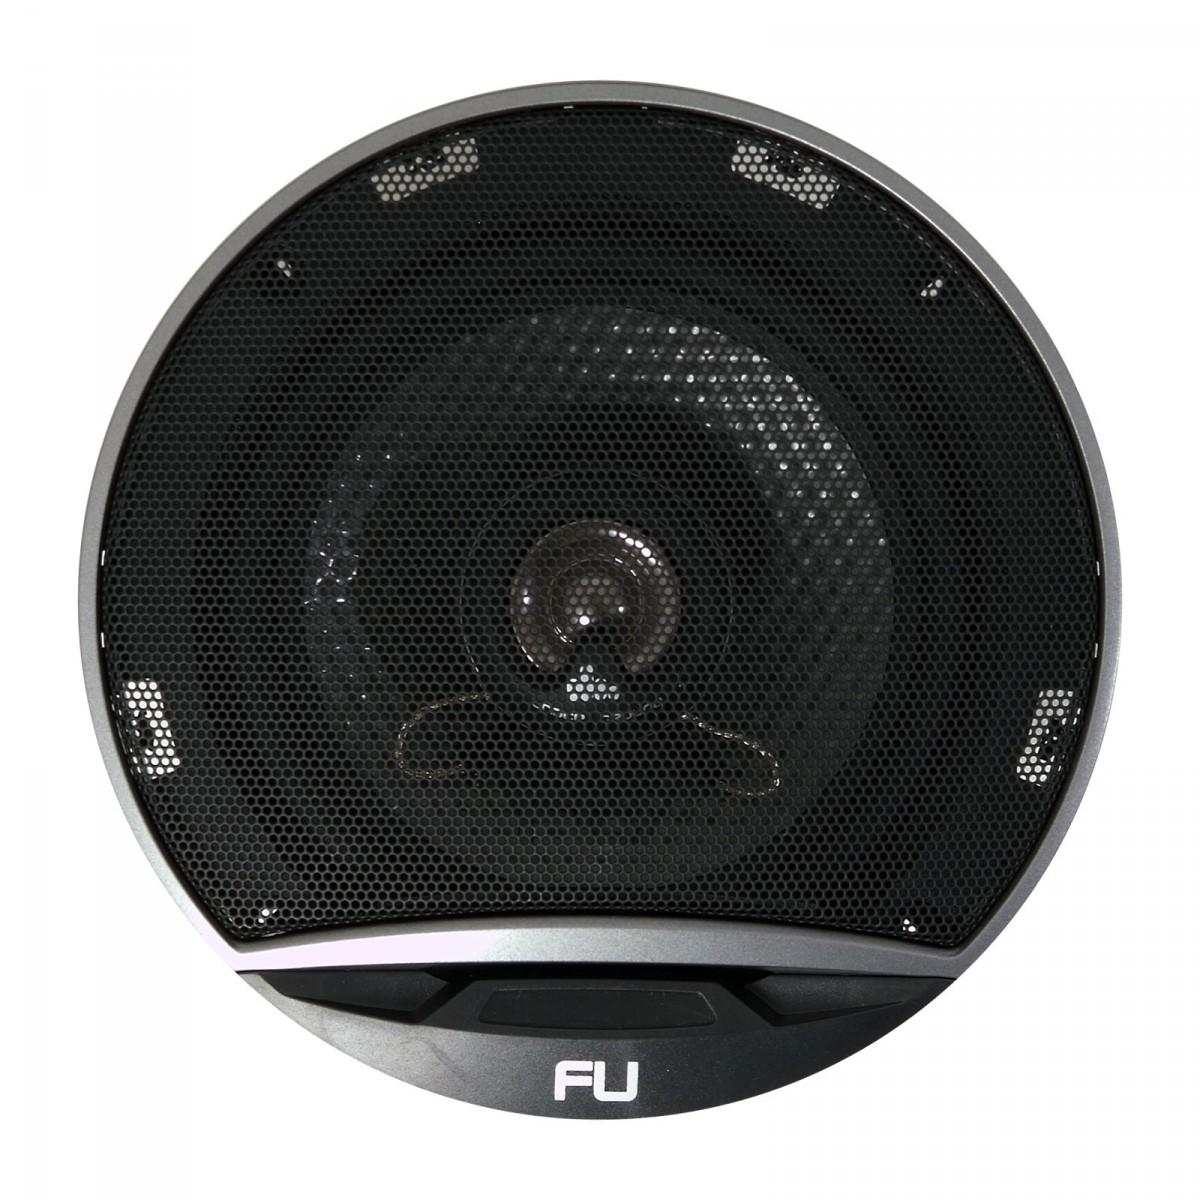 FLI Underground FU6-F4